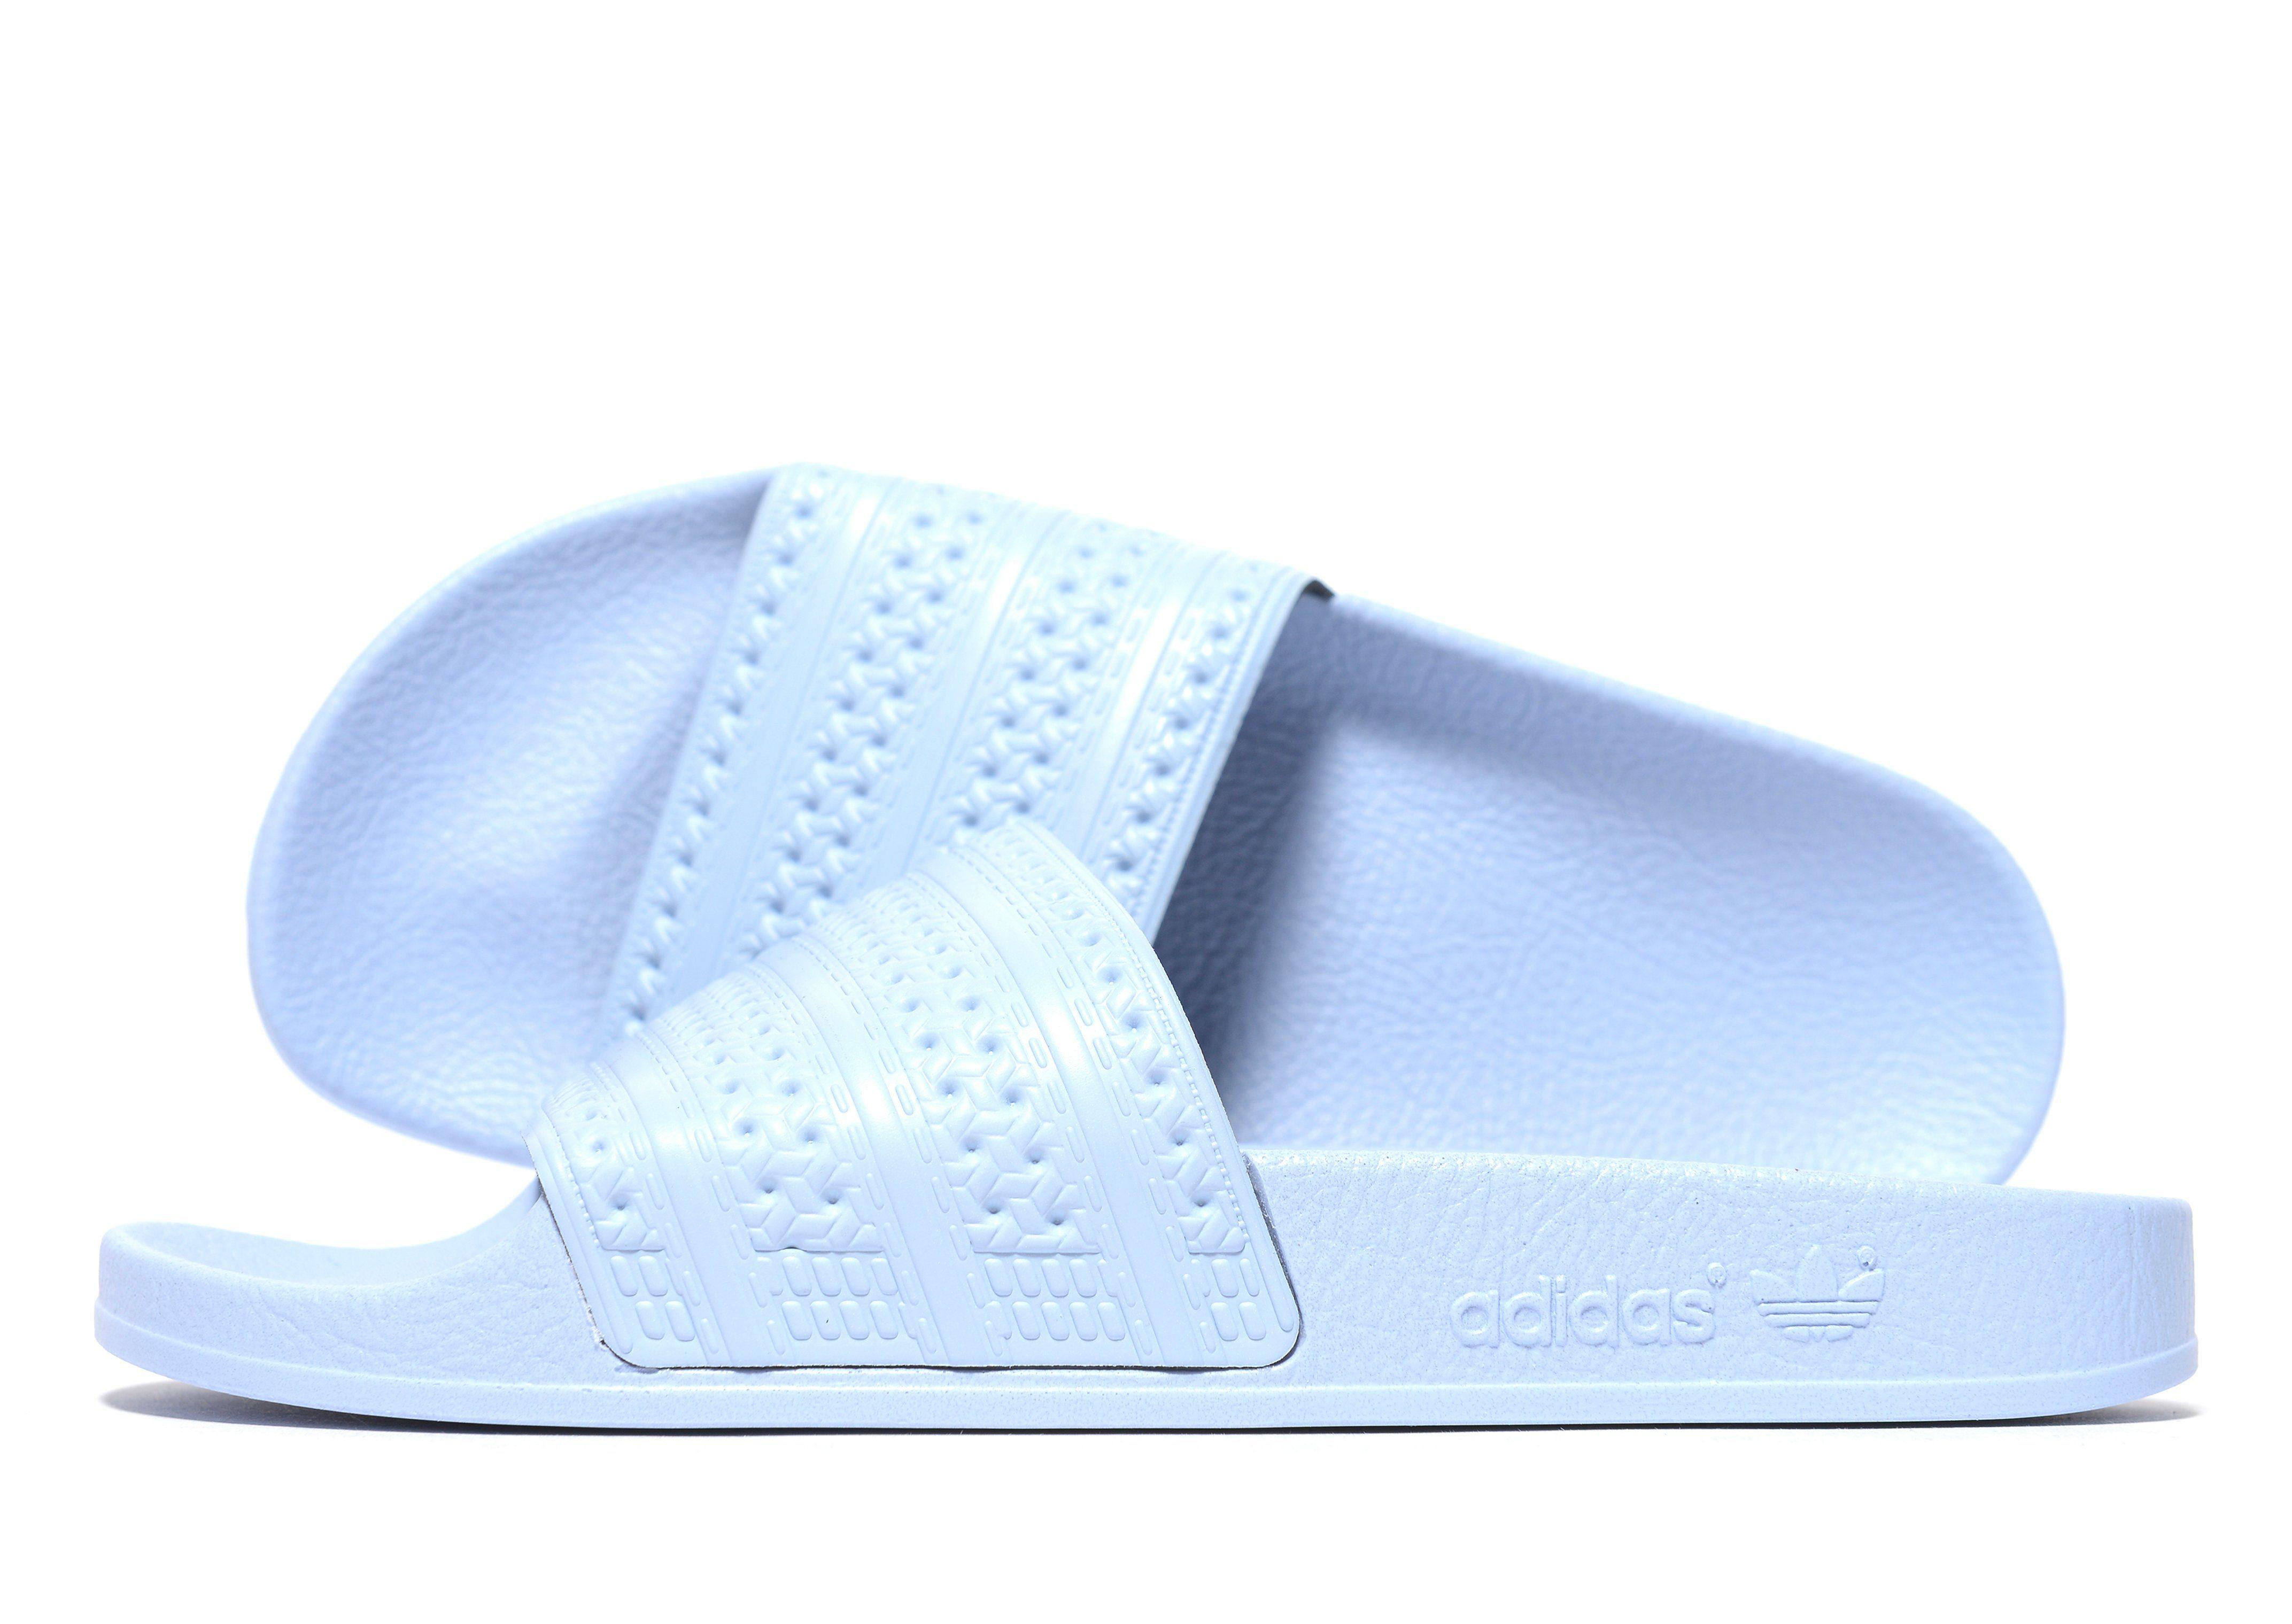 bcc7c77c70eca9 adidas Originals Adilette Slides Dames | JD Sports